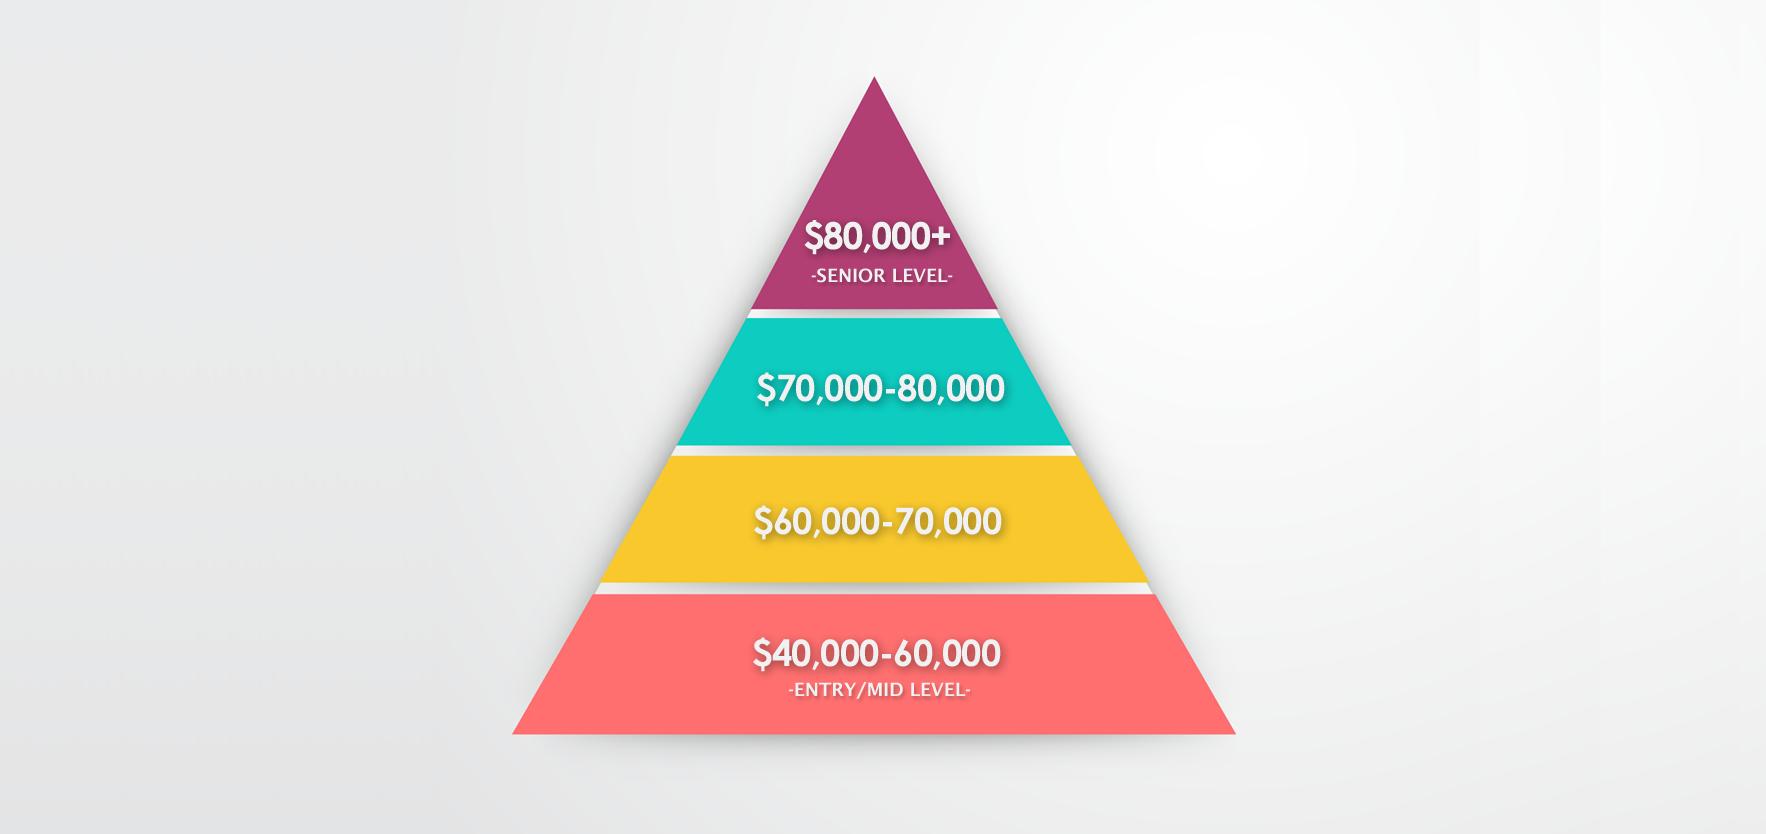 Gis Salary Expectations Climb The Gis Career Ladder Gis